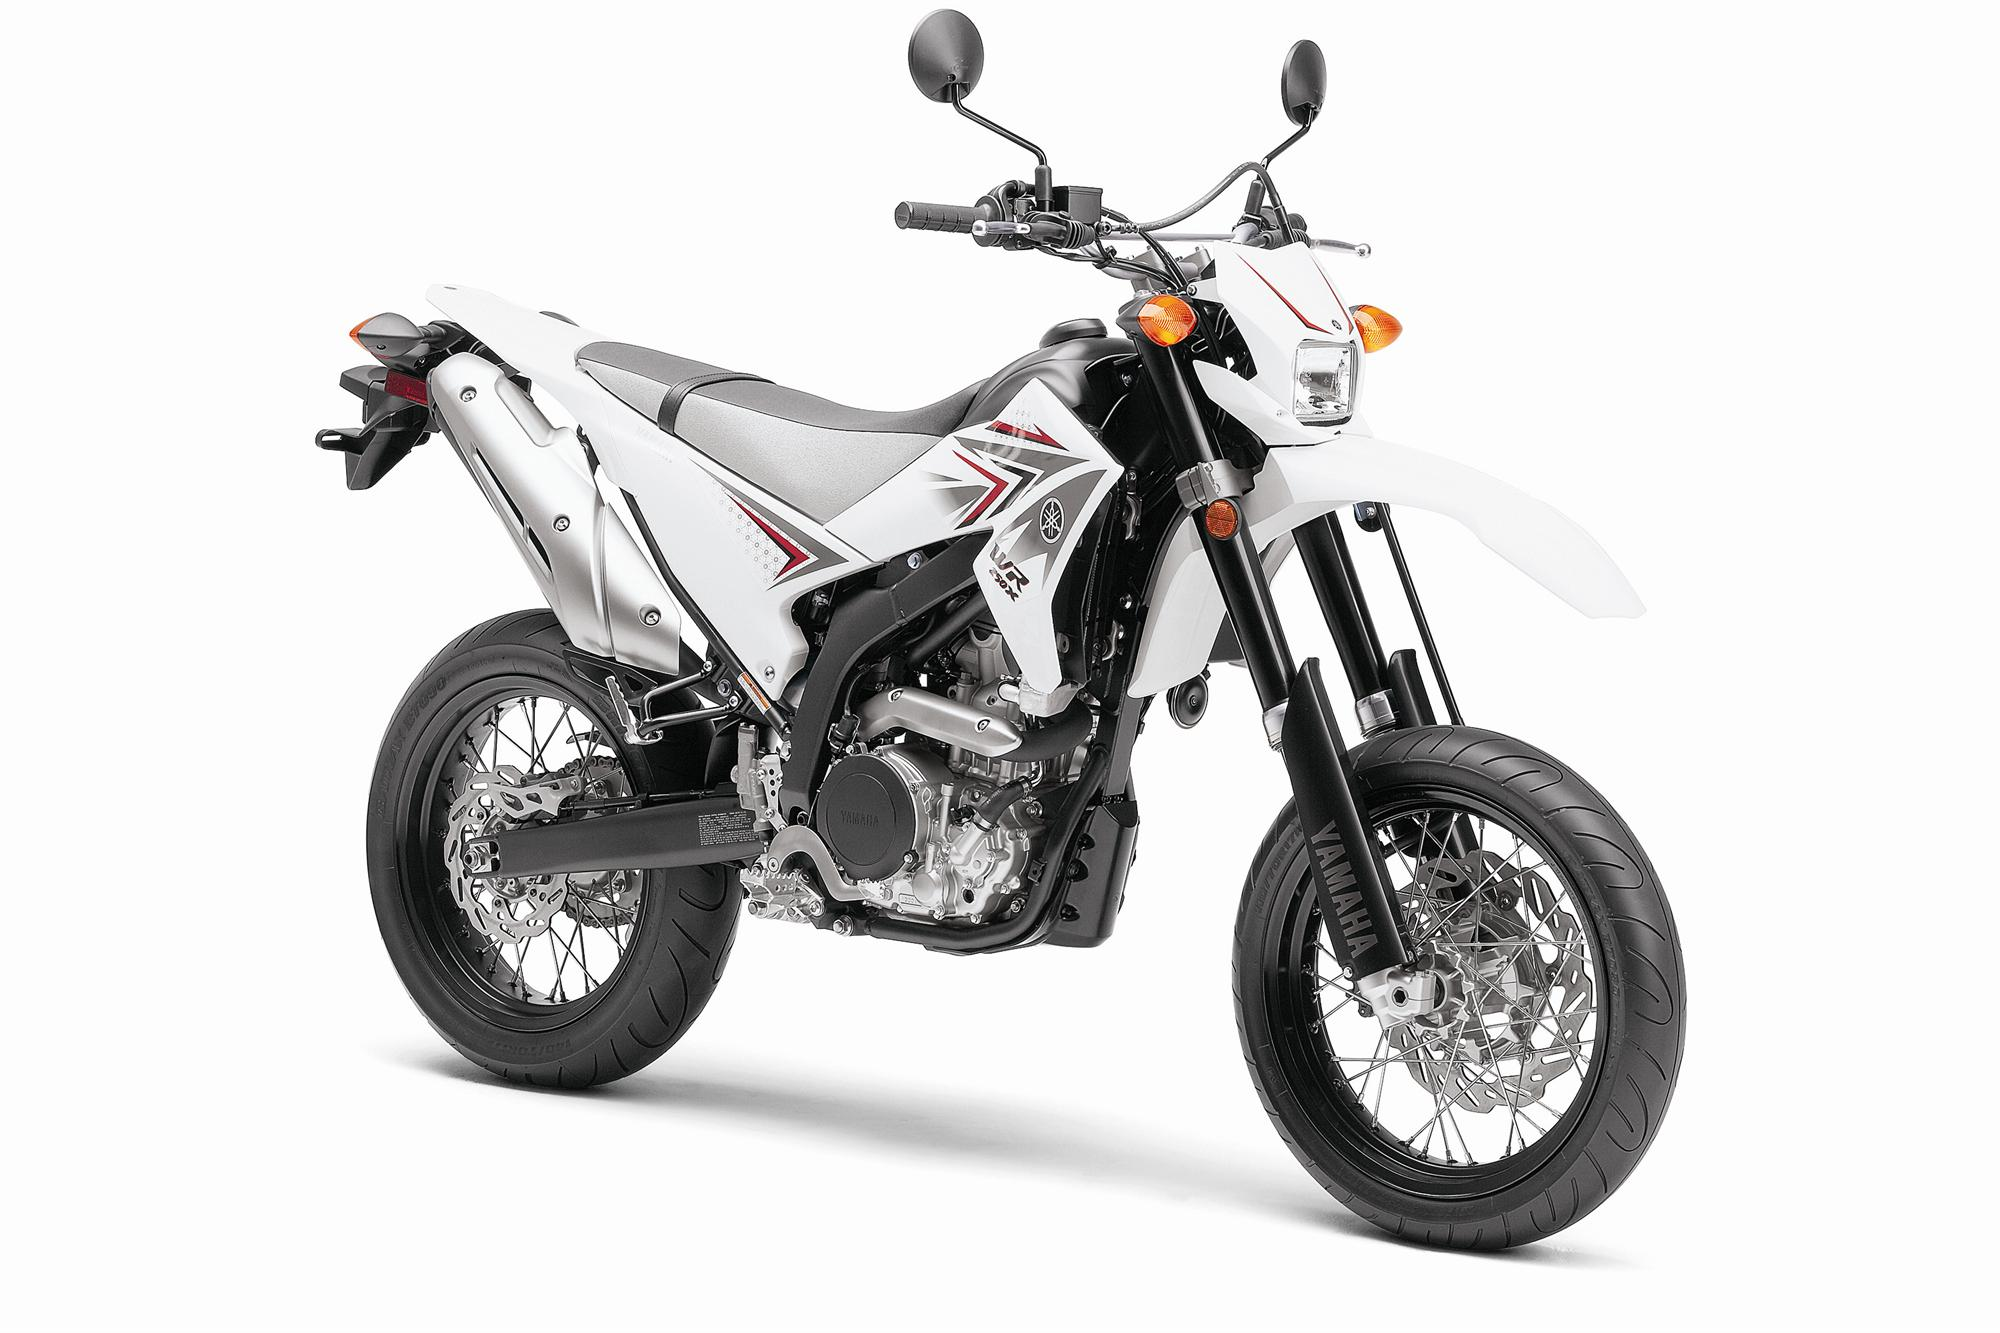 Yamaha Wrx Price Philippines